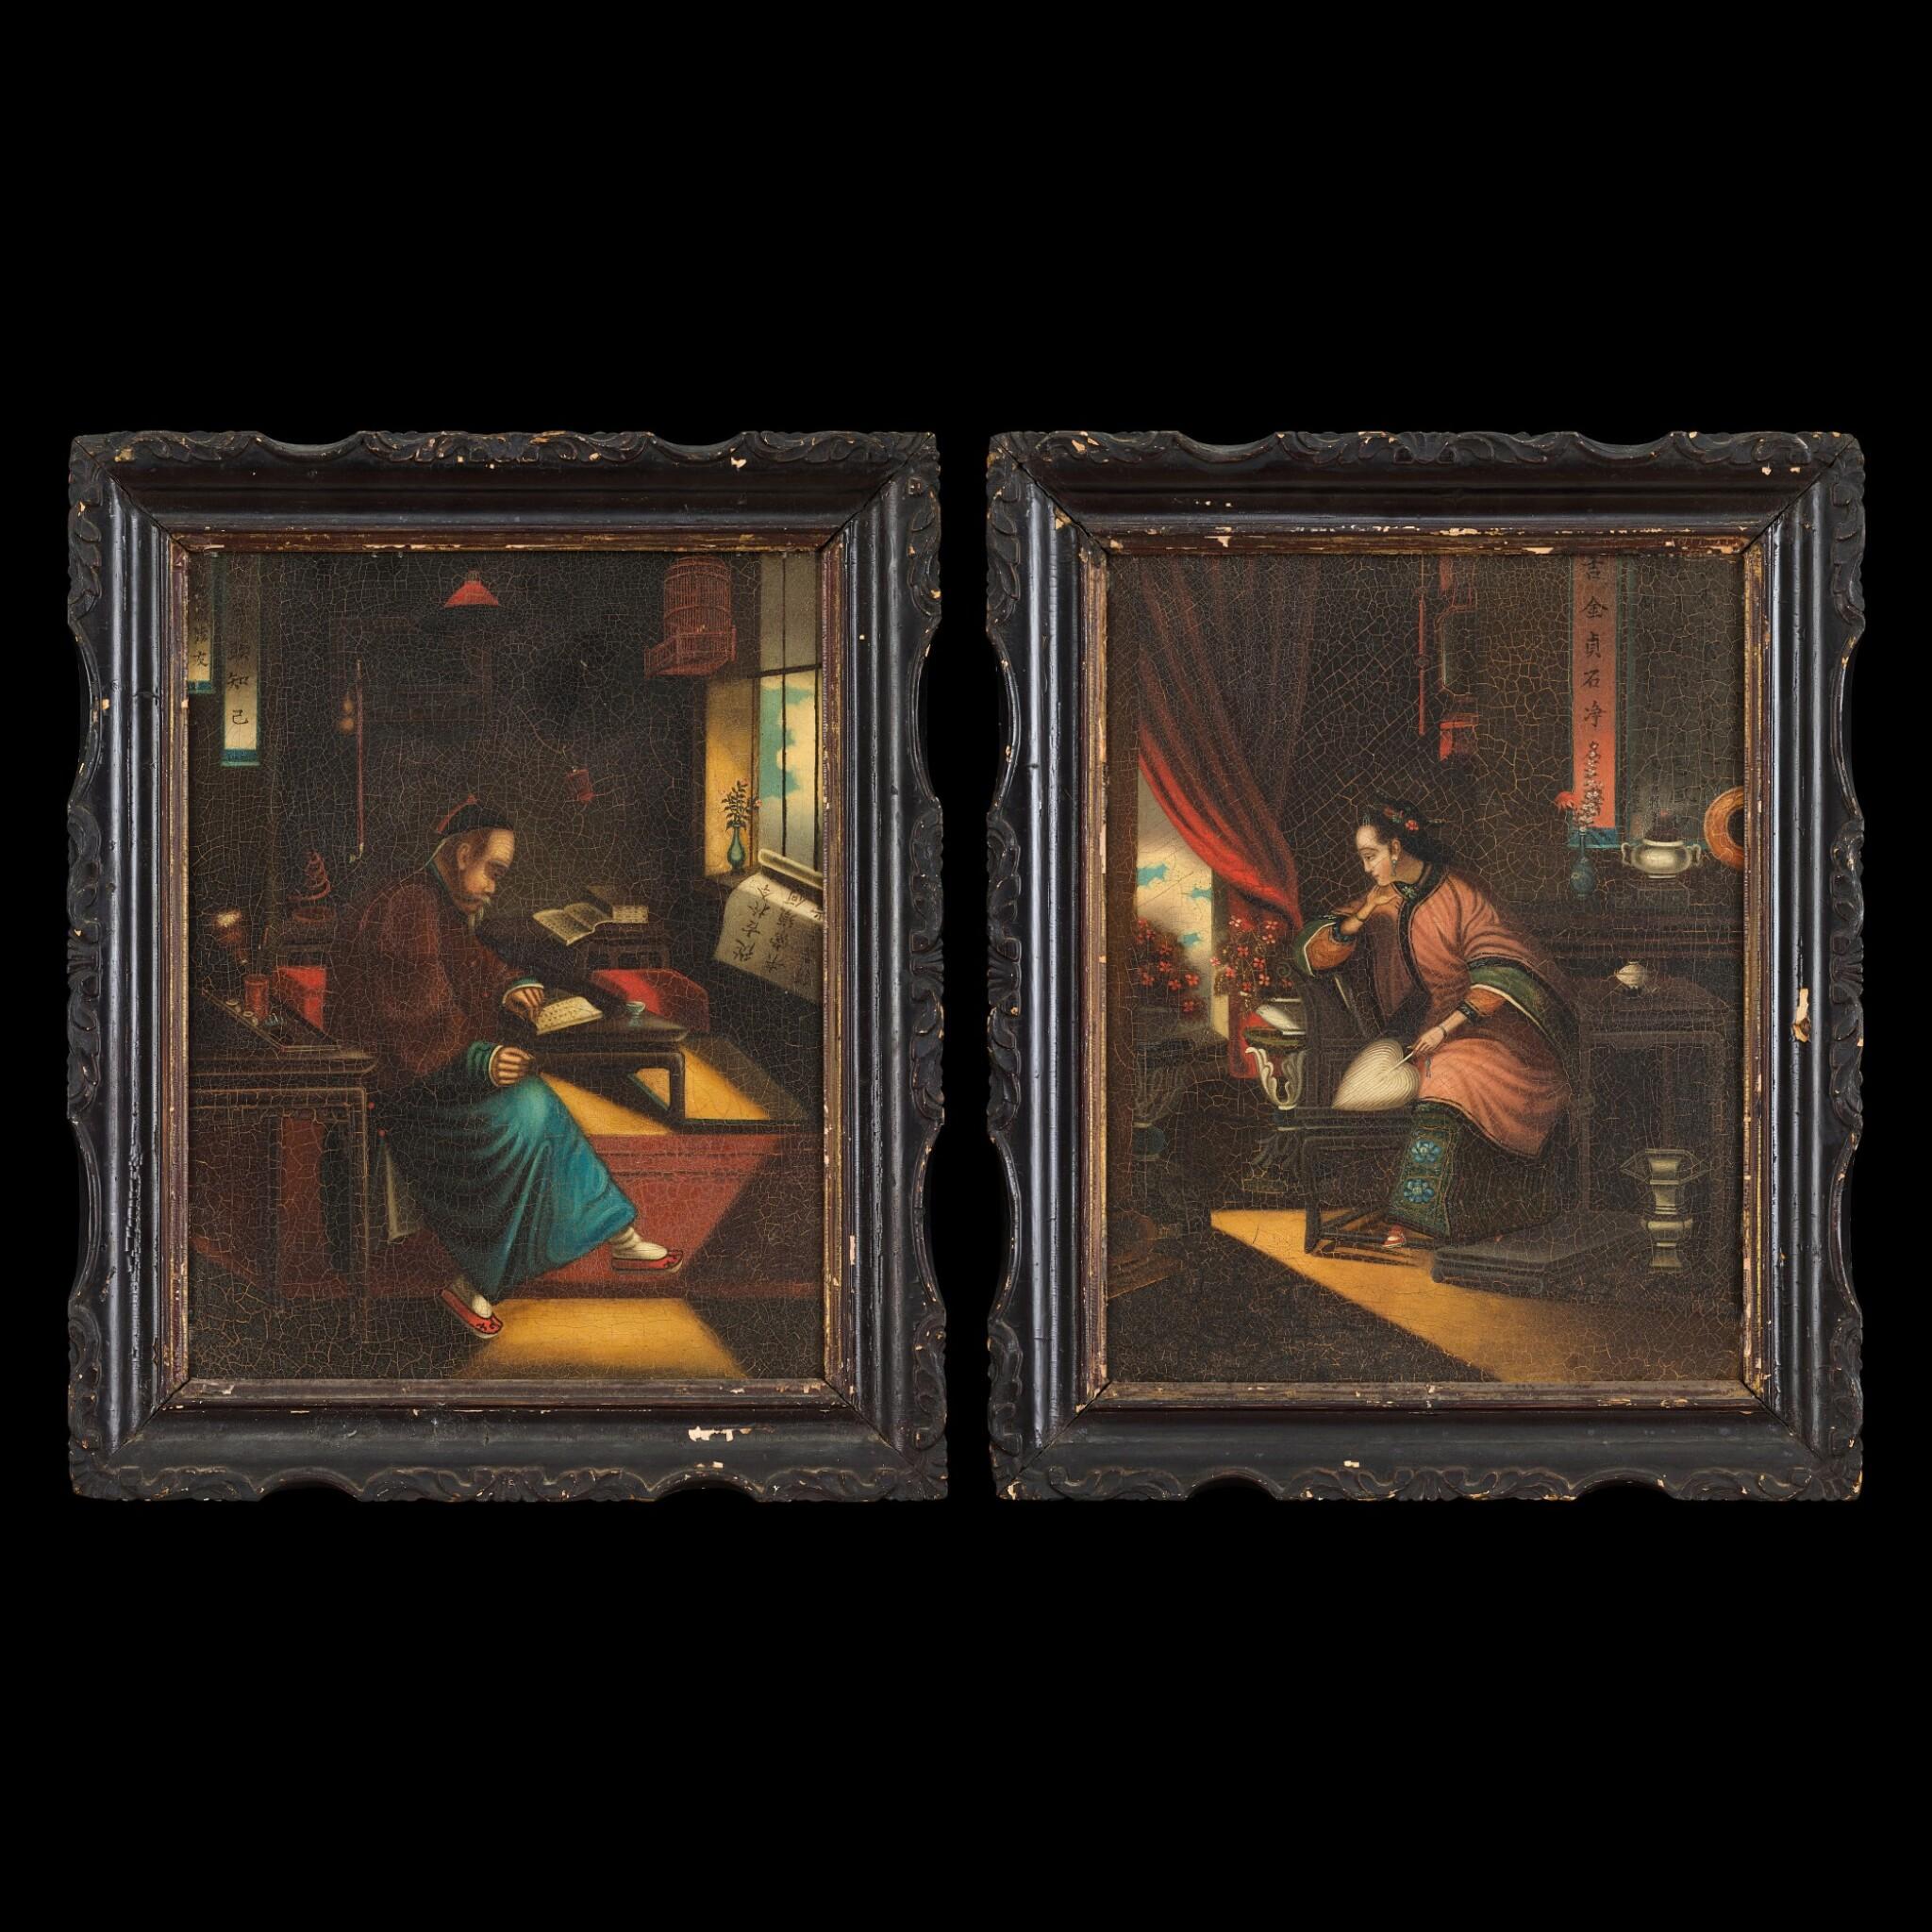 View full screen - View 1 of Lot 189. Anglo-Chinese School, Early 19th century Mandarin Scholar and His Wife | 十九世紀初 英裔中國畫派   中國學者伉儷肖像一組兩幅   布本油畫 木框.